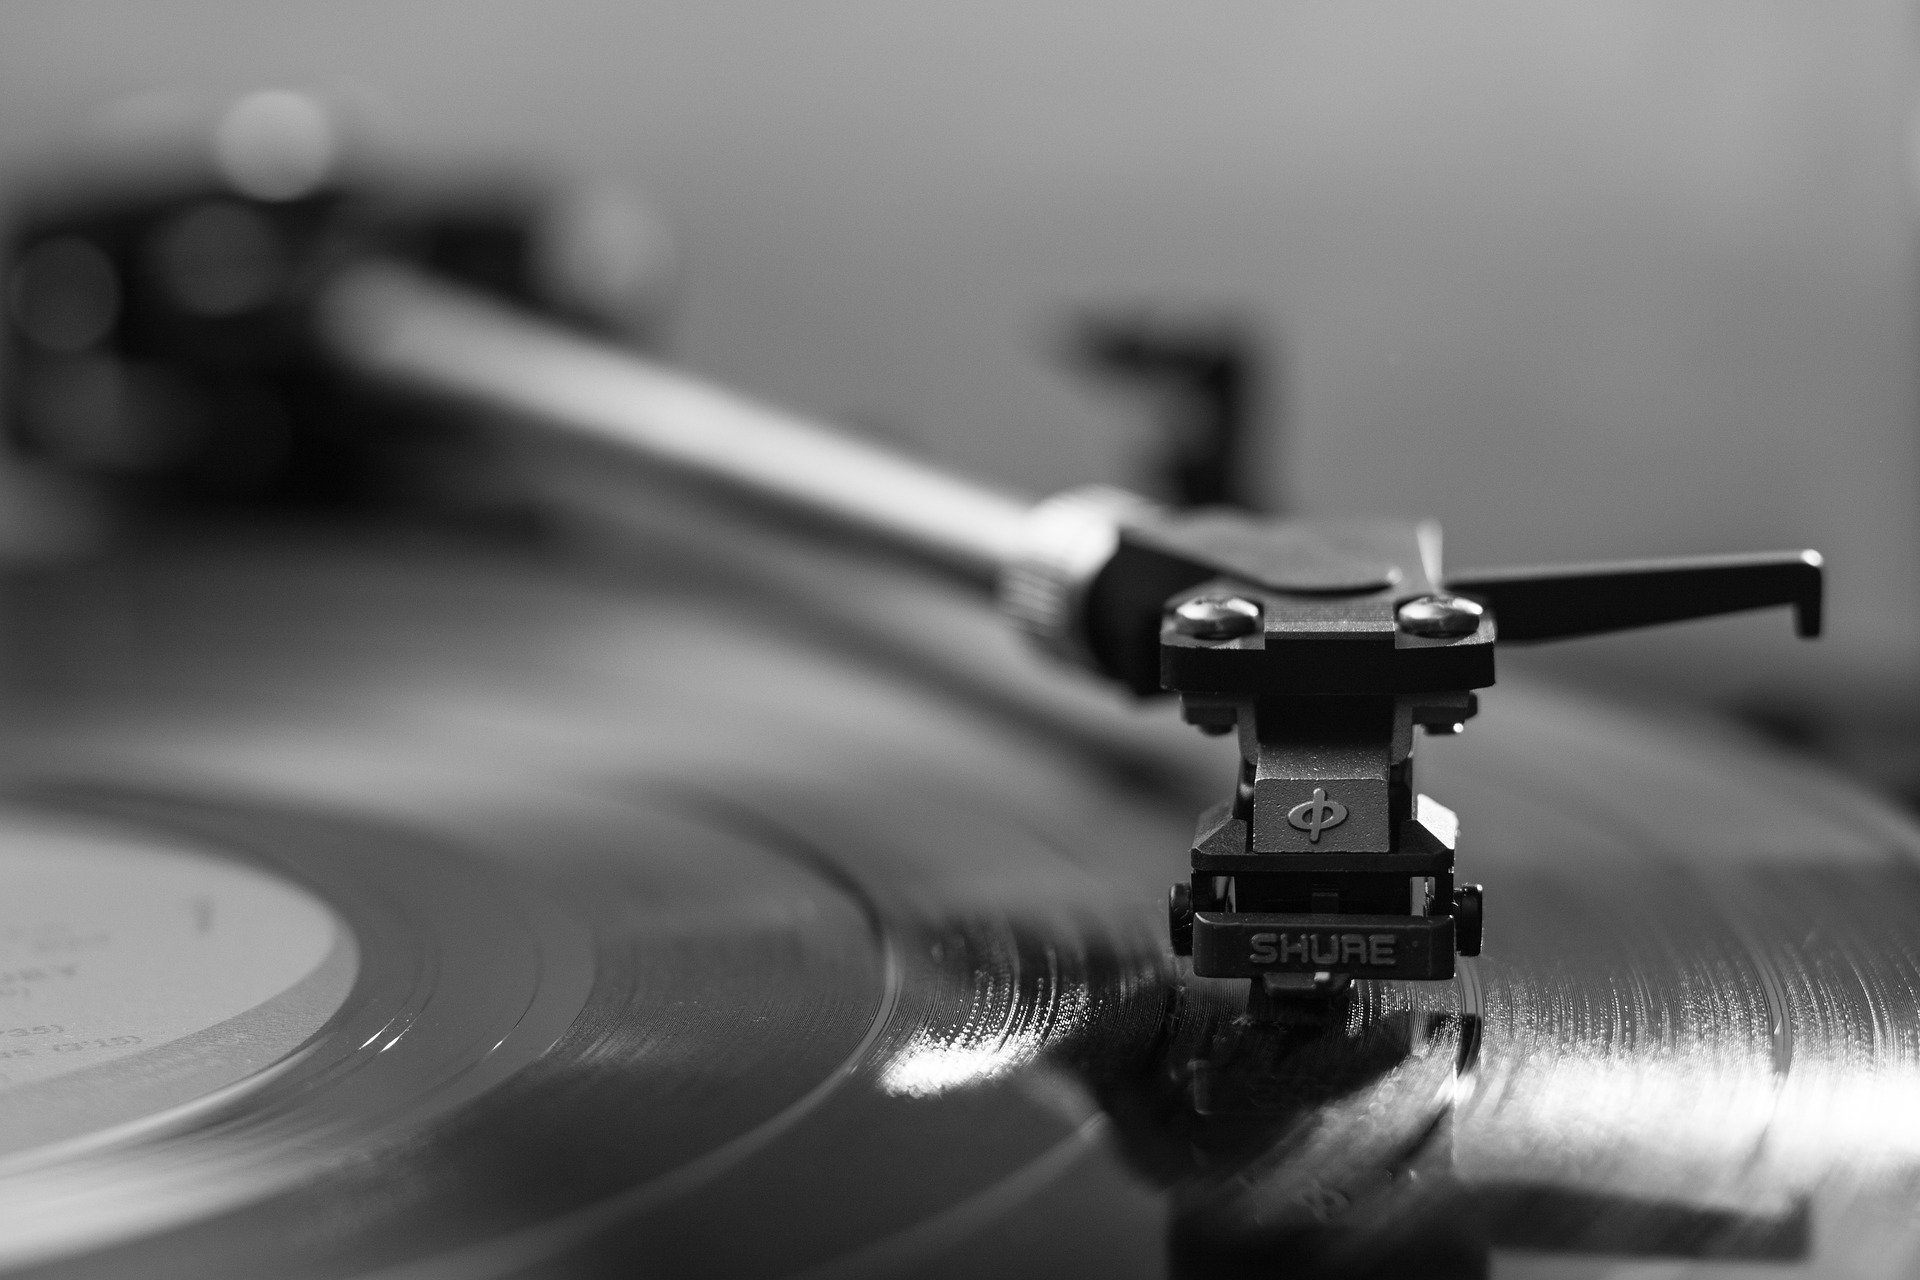 Tonstudio Limbach-Oberfrohna